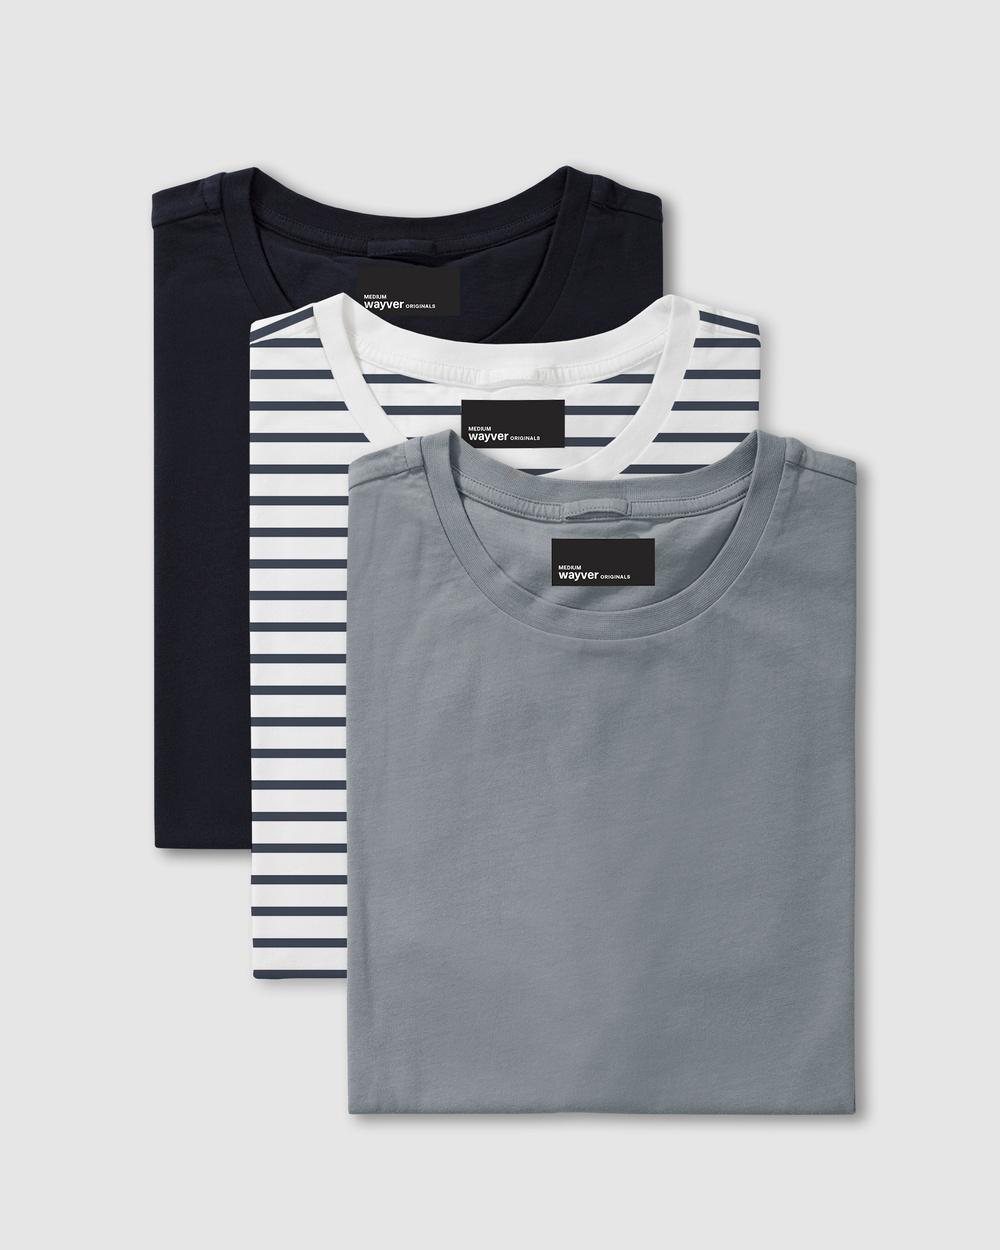 Wayver - The Essential Crew Tee 3 Pack - Short Sleeve T-Shirts (Navy, Indigo Stripe & Steel) The Essential Crew Tee 3-Pack